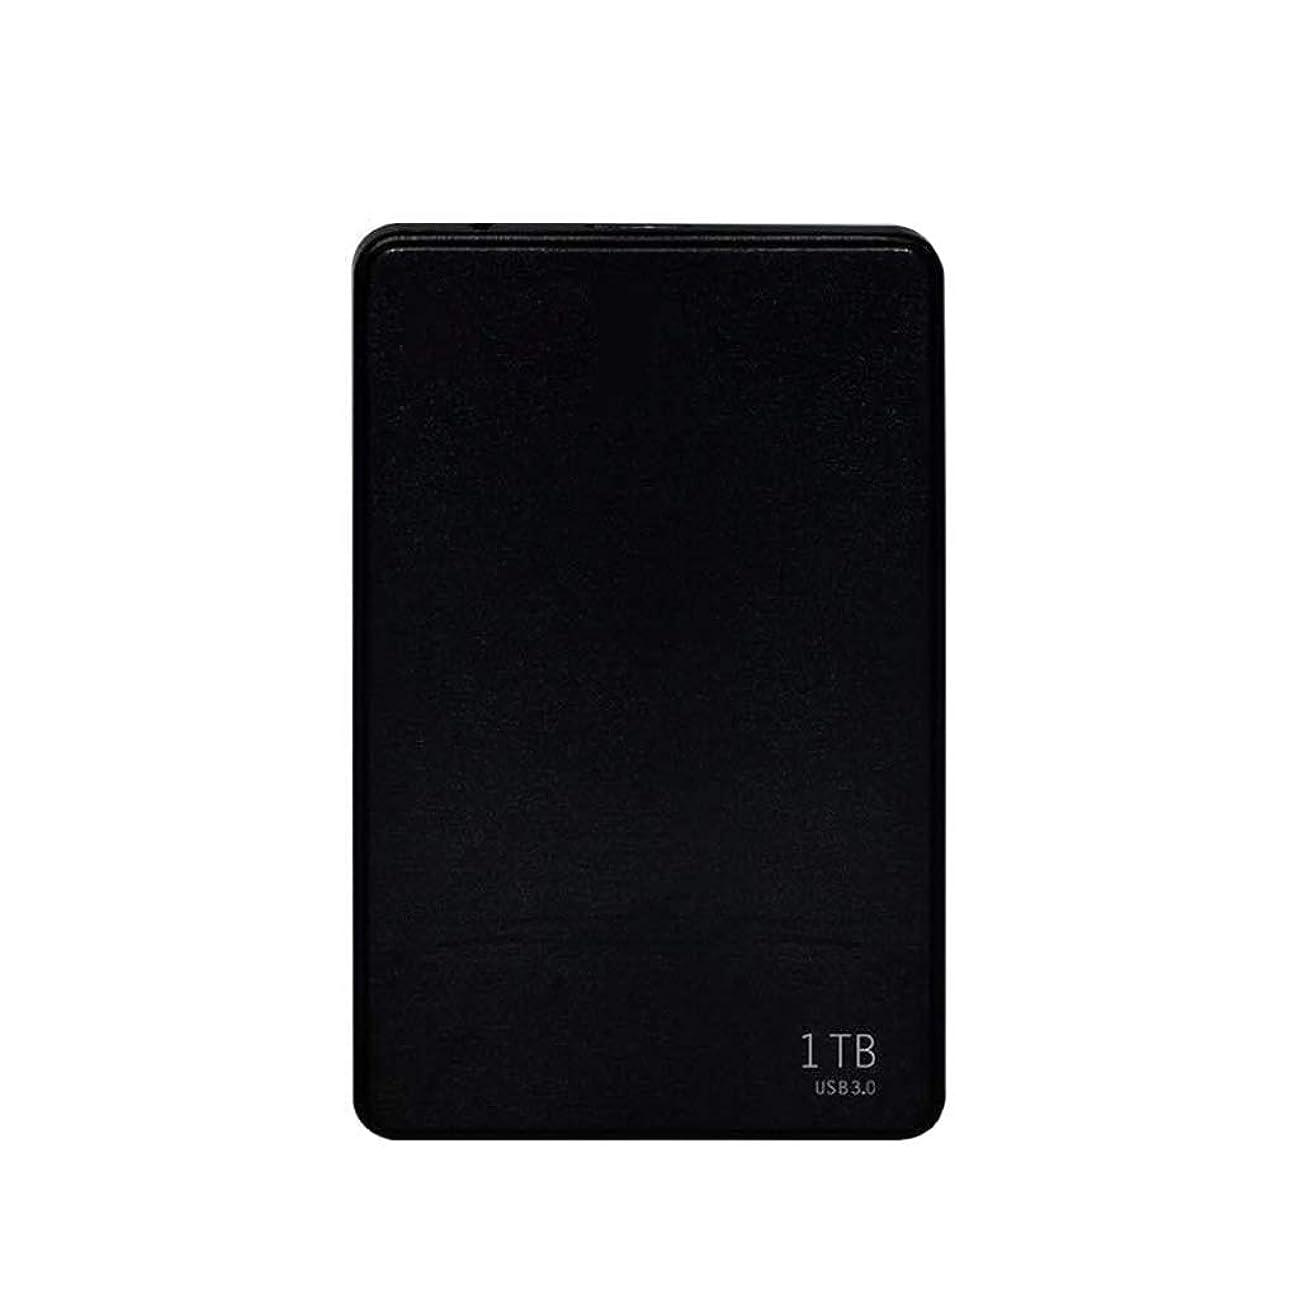 Mobile Hard Disk 80G/160/250/320/500/1TB High-Speed Transmission USB3.0 Large Memory Computer External Mobile Portable Hard Disk Black (Size : 500GB)